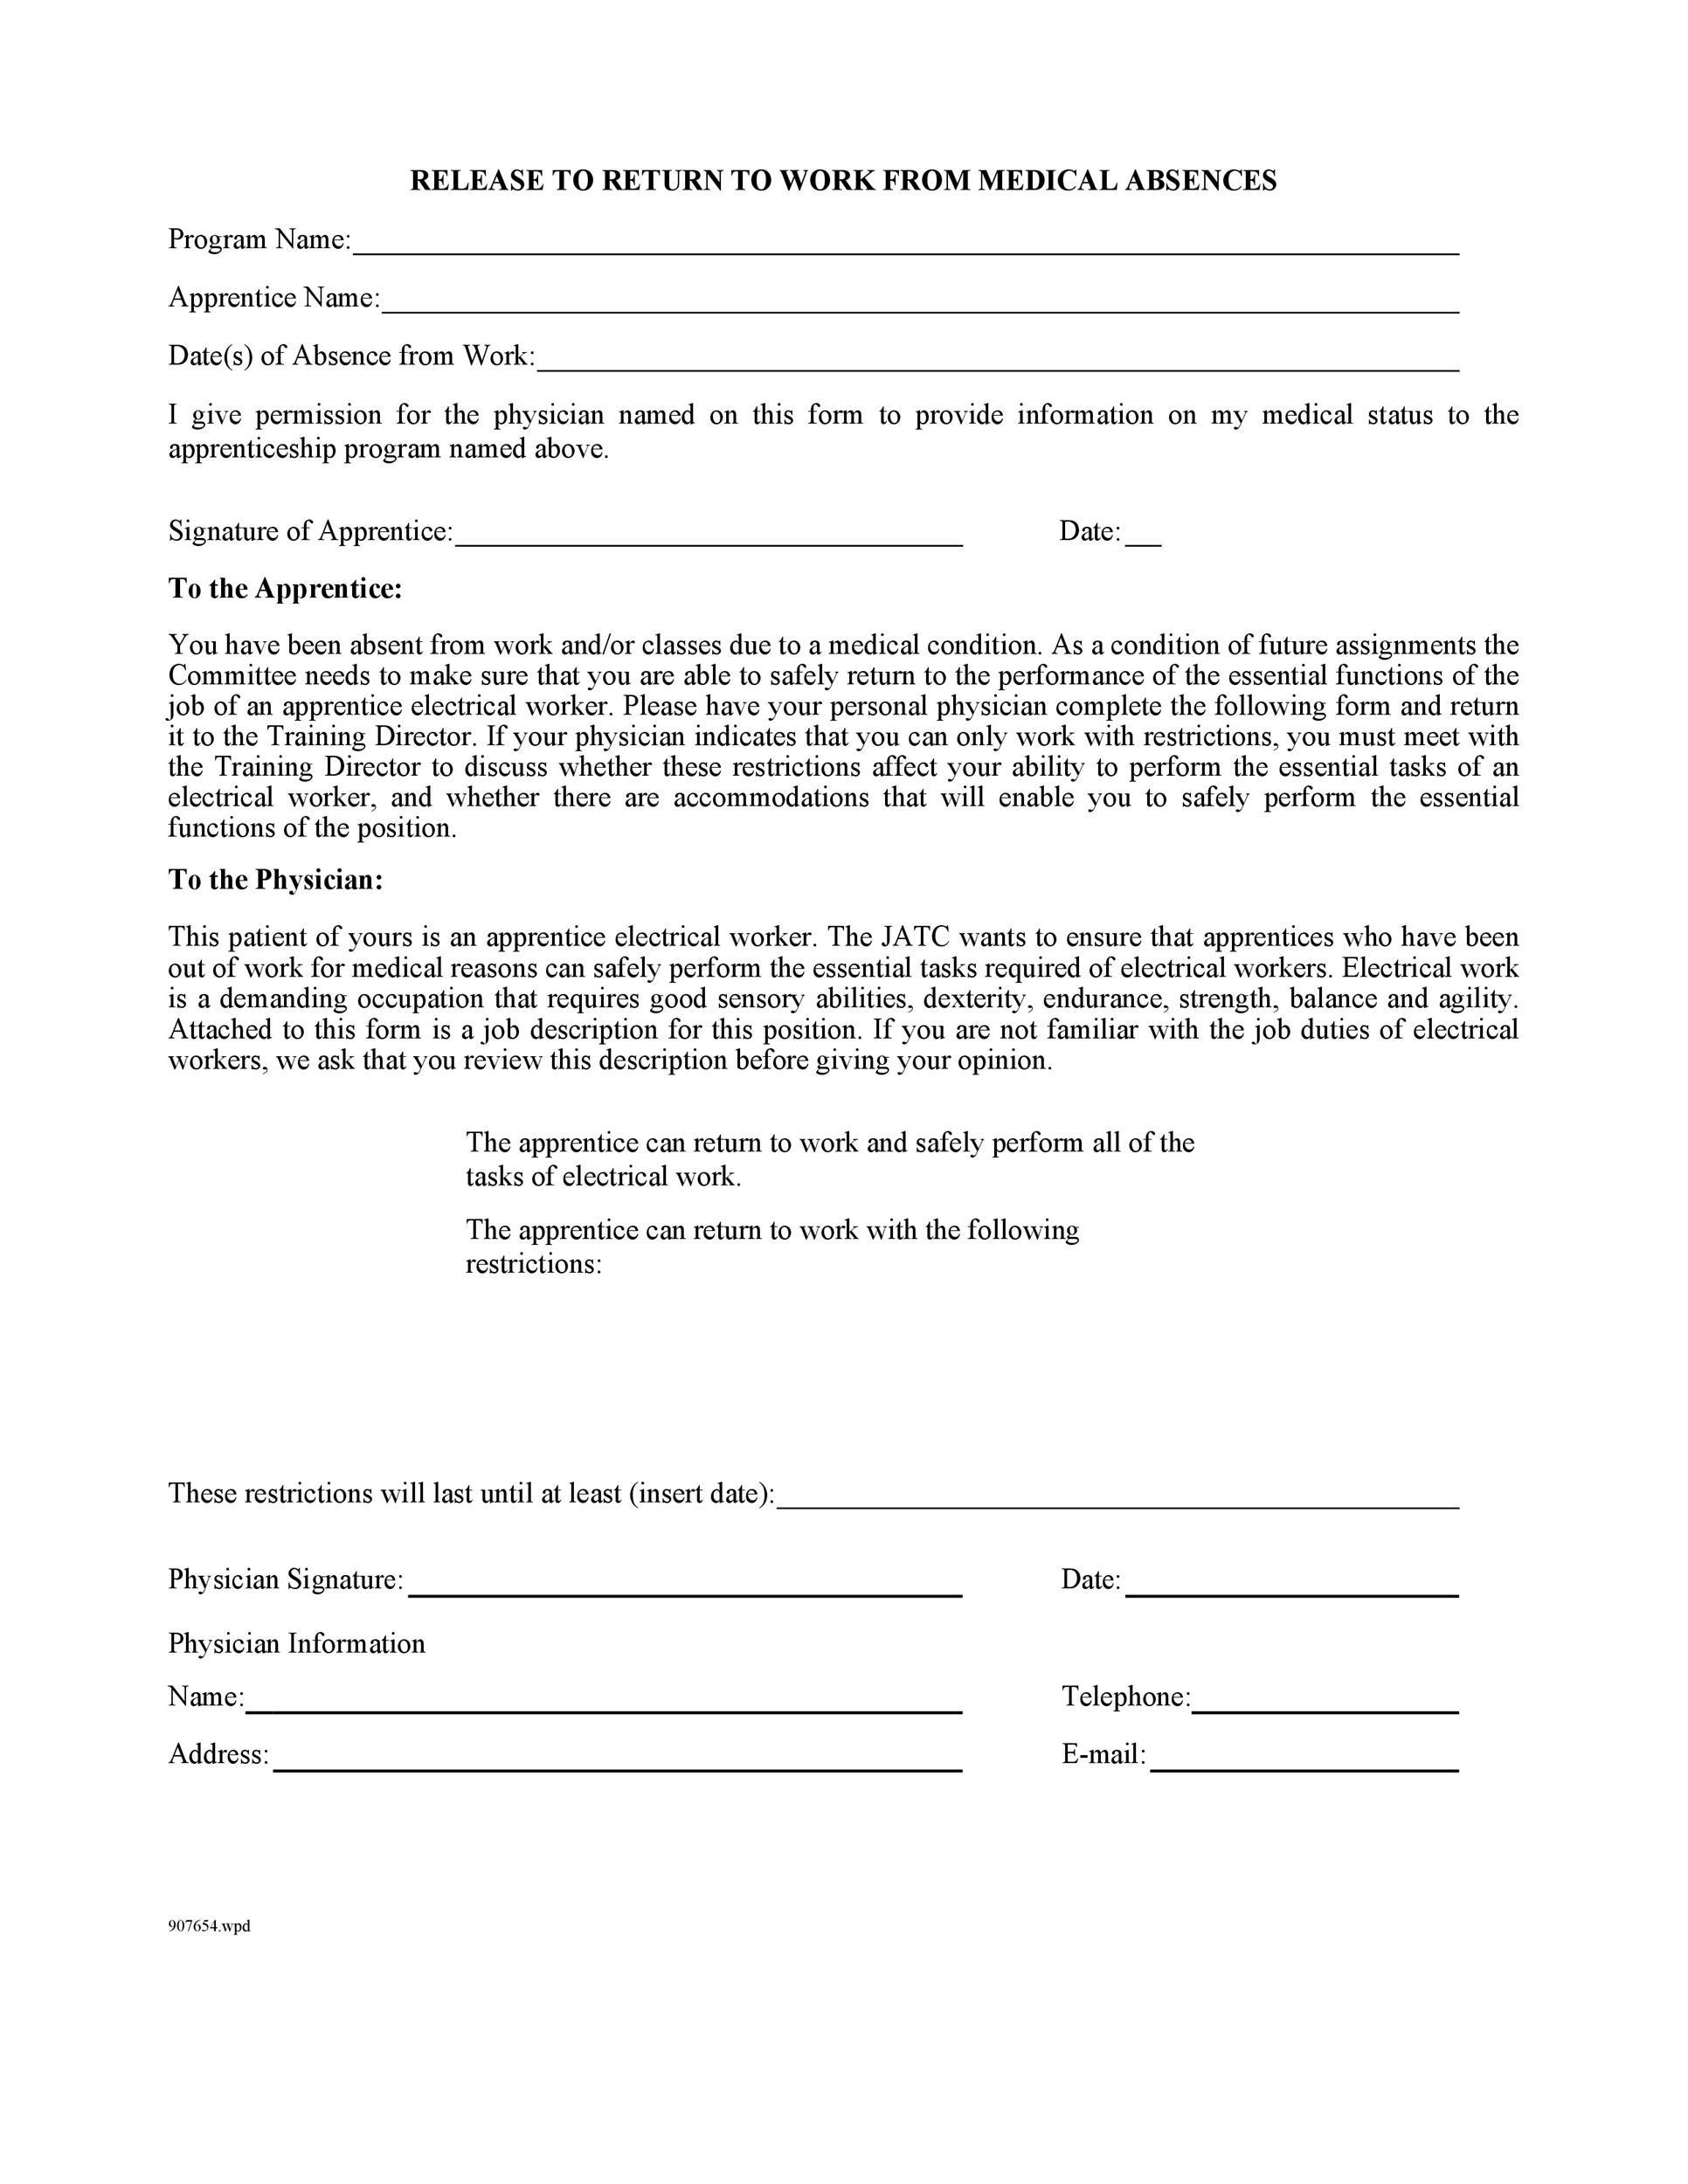 Free return to work form 27